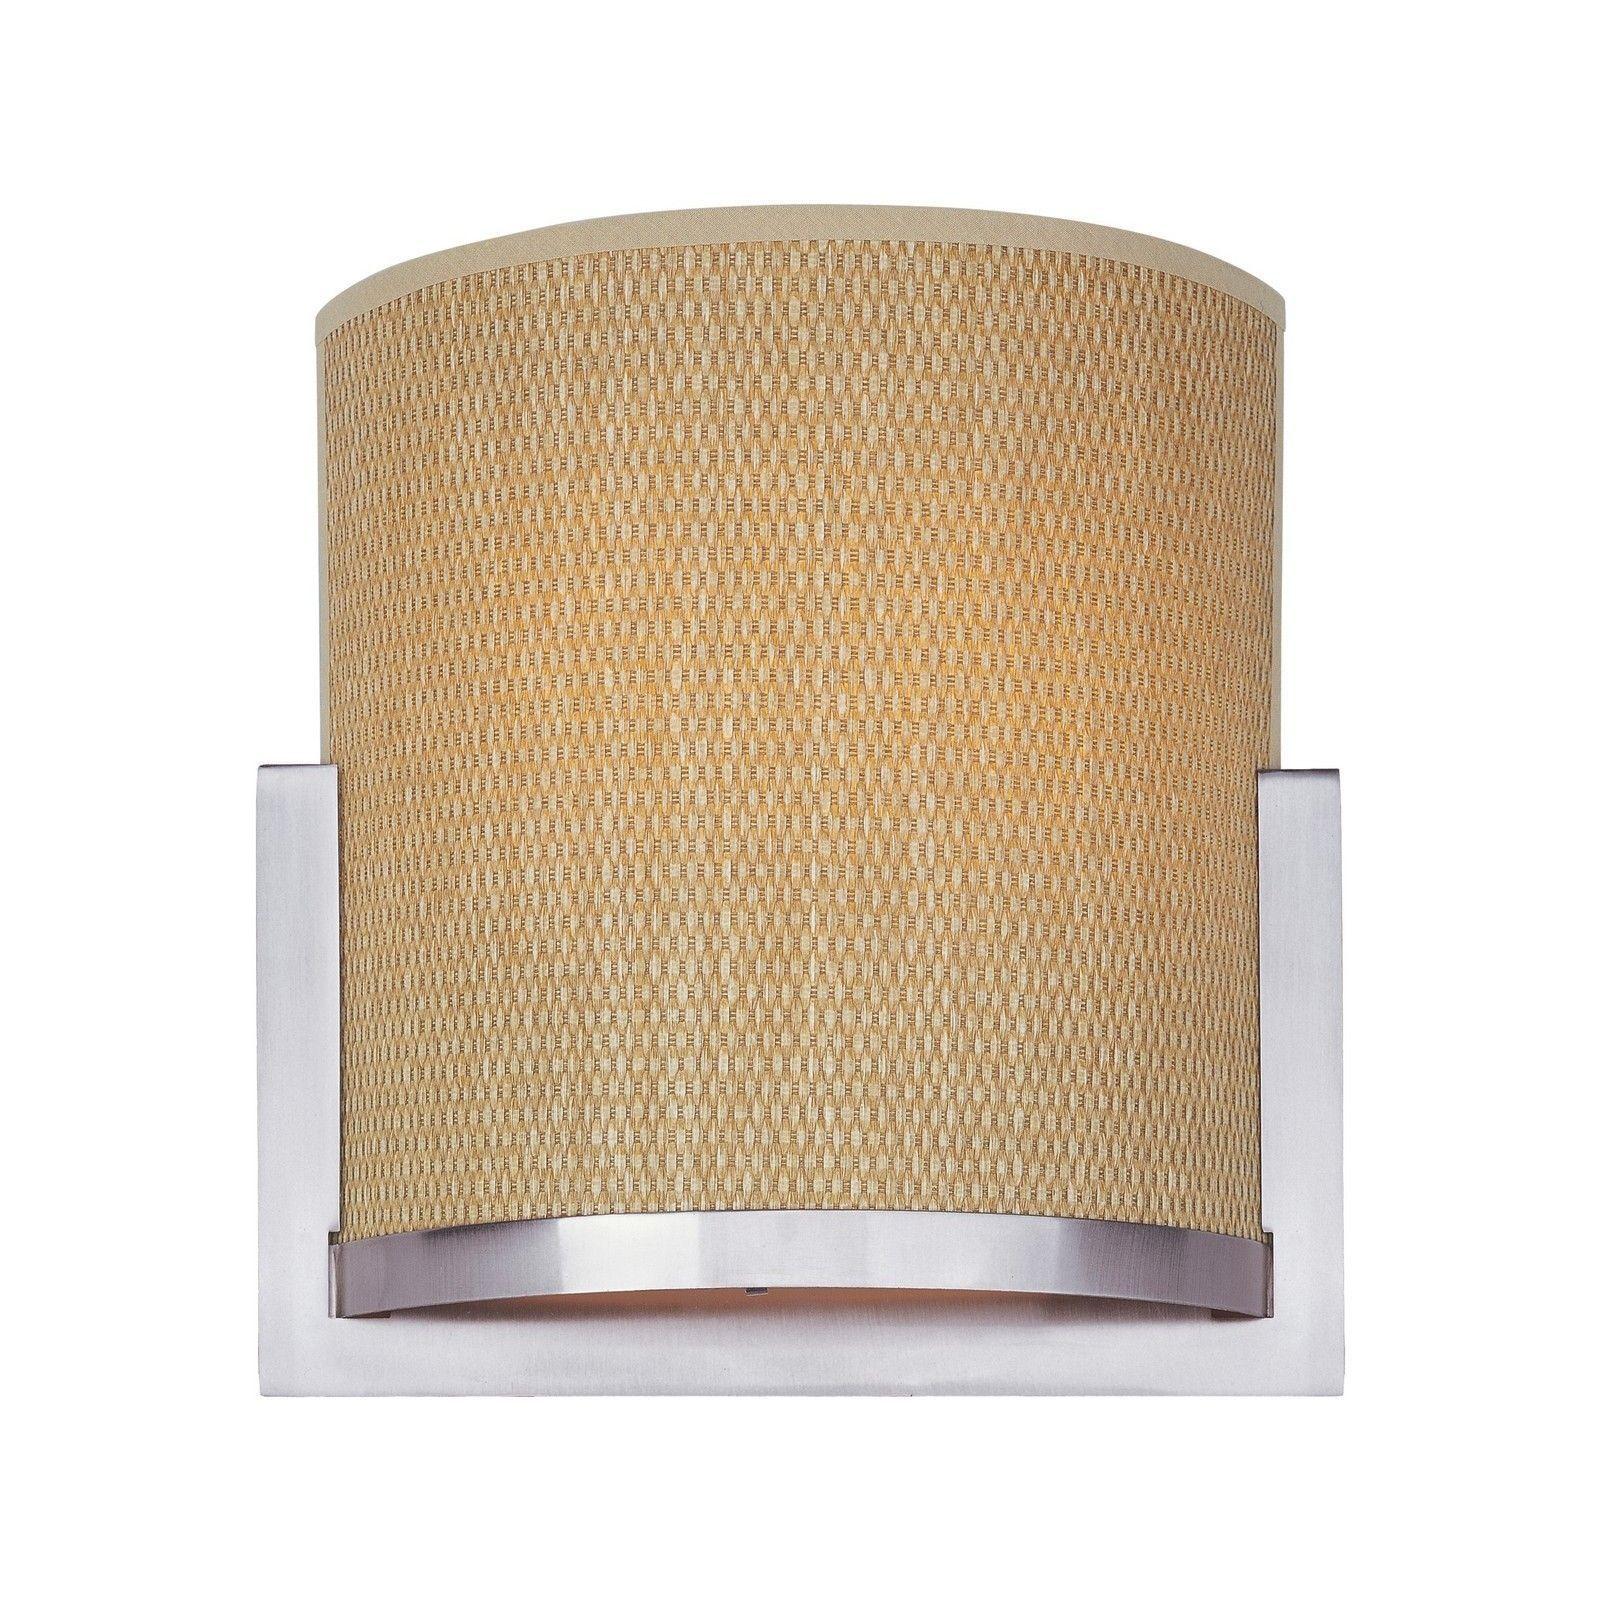 Maxim Lighting Elements Nickel 2-light Wall Sconce